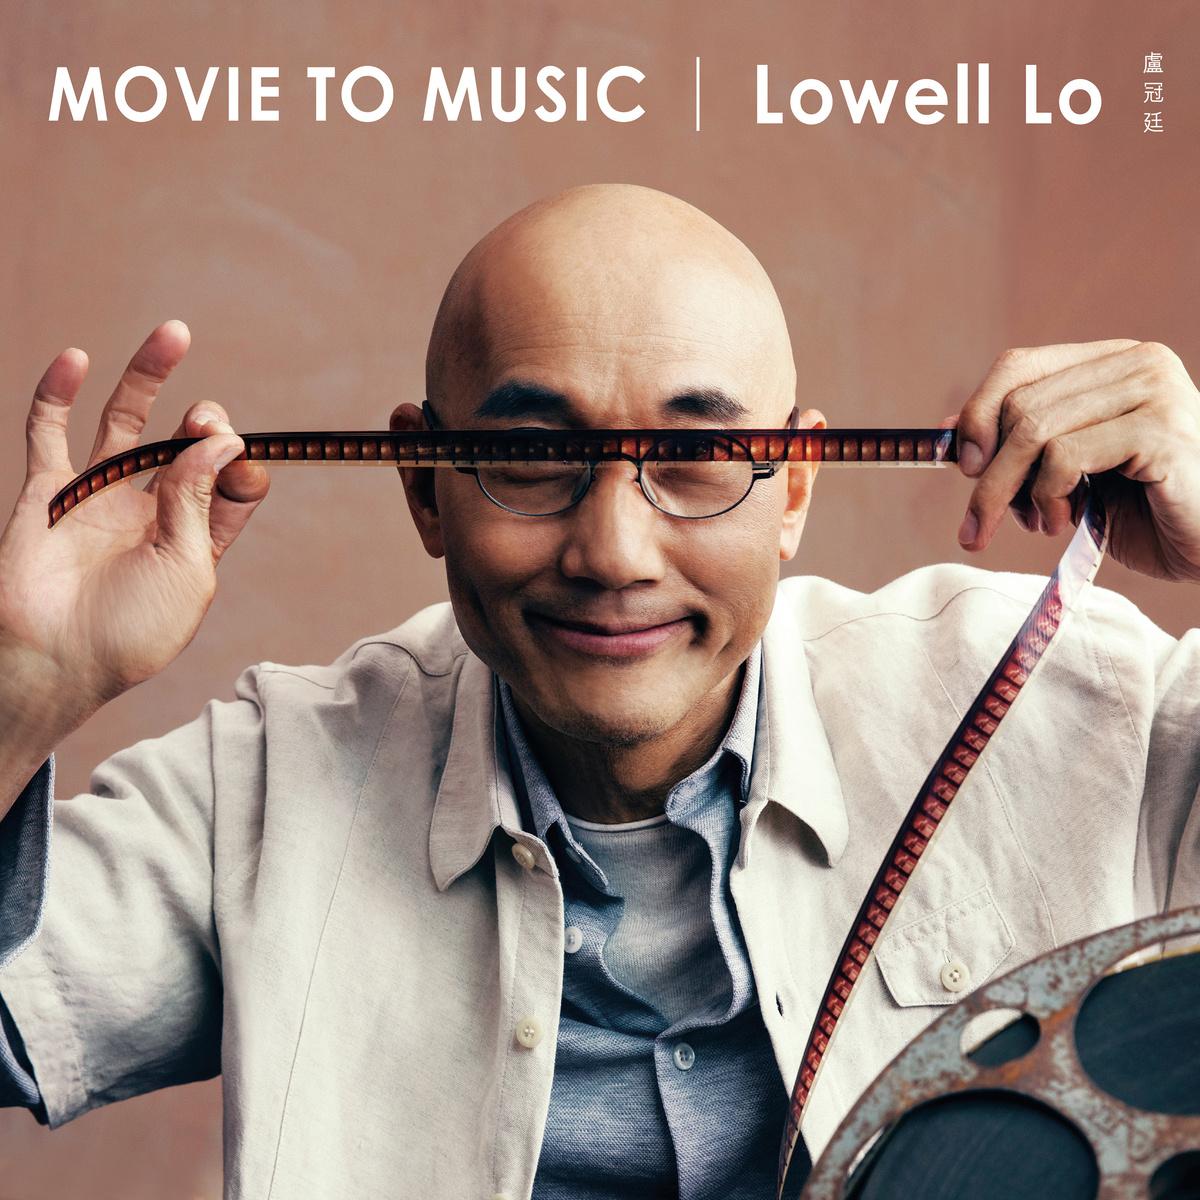 卢冠廷 Movie to Music